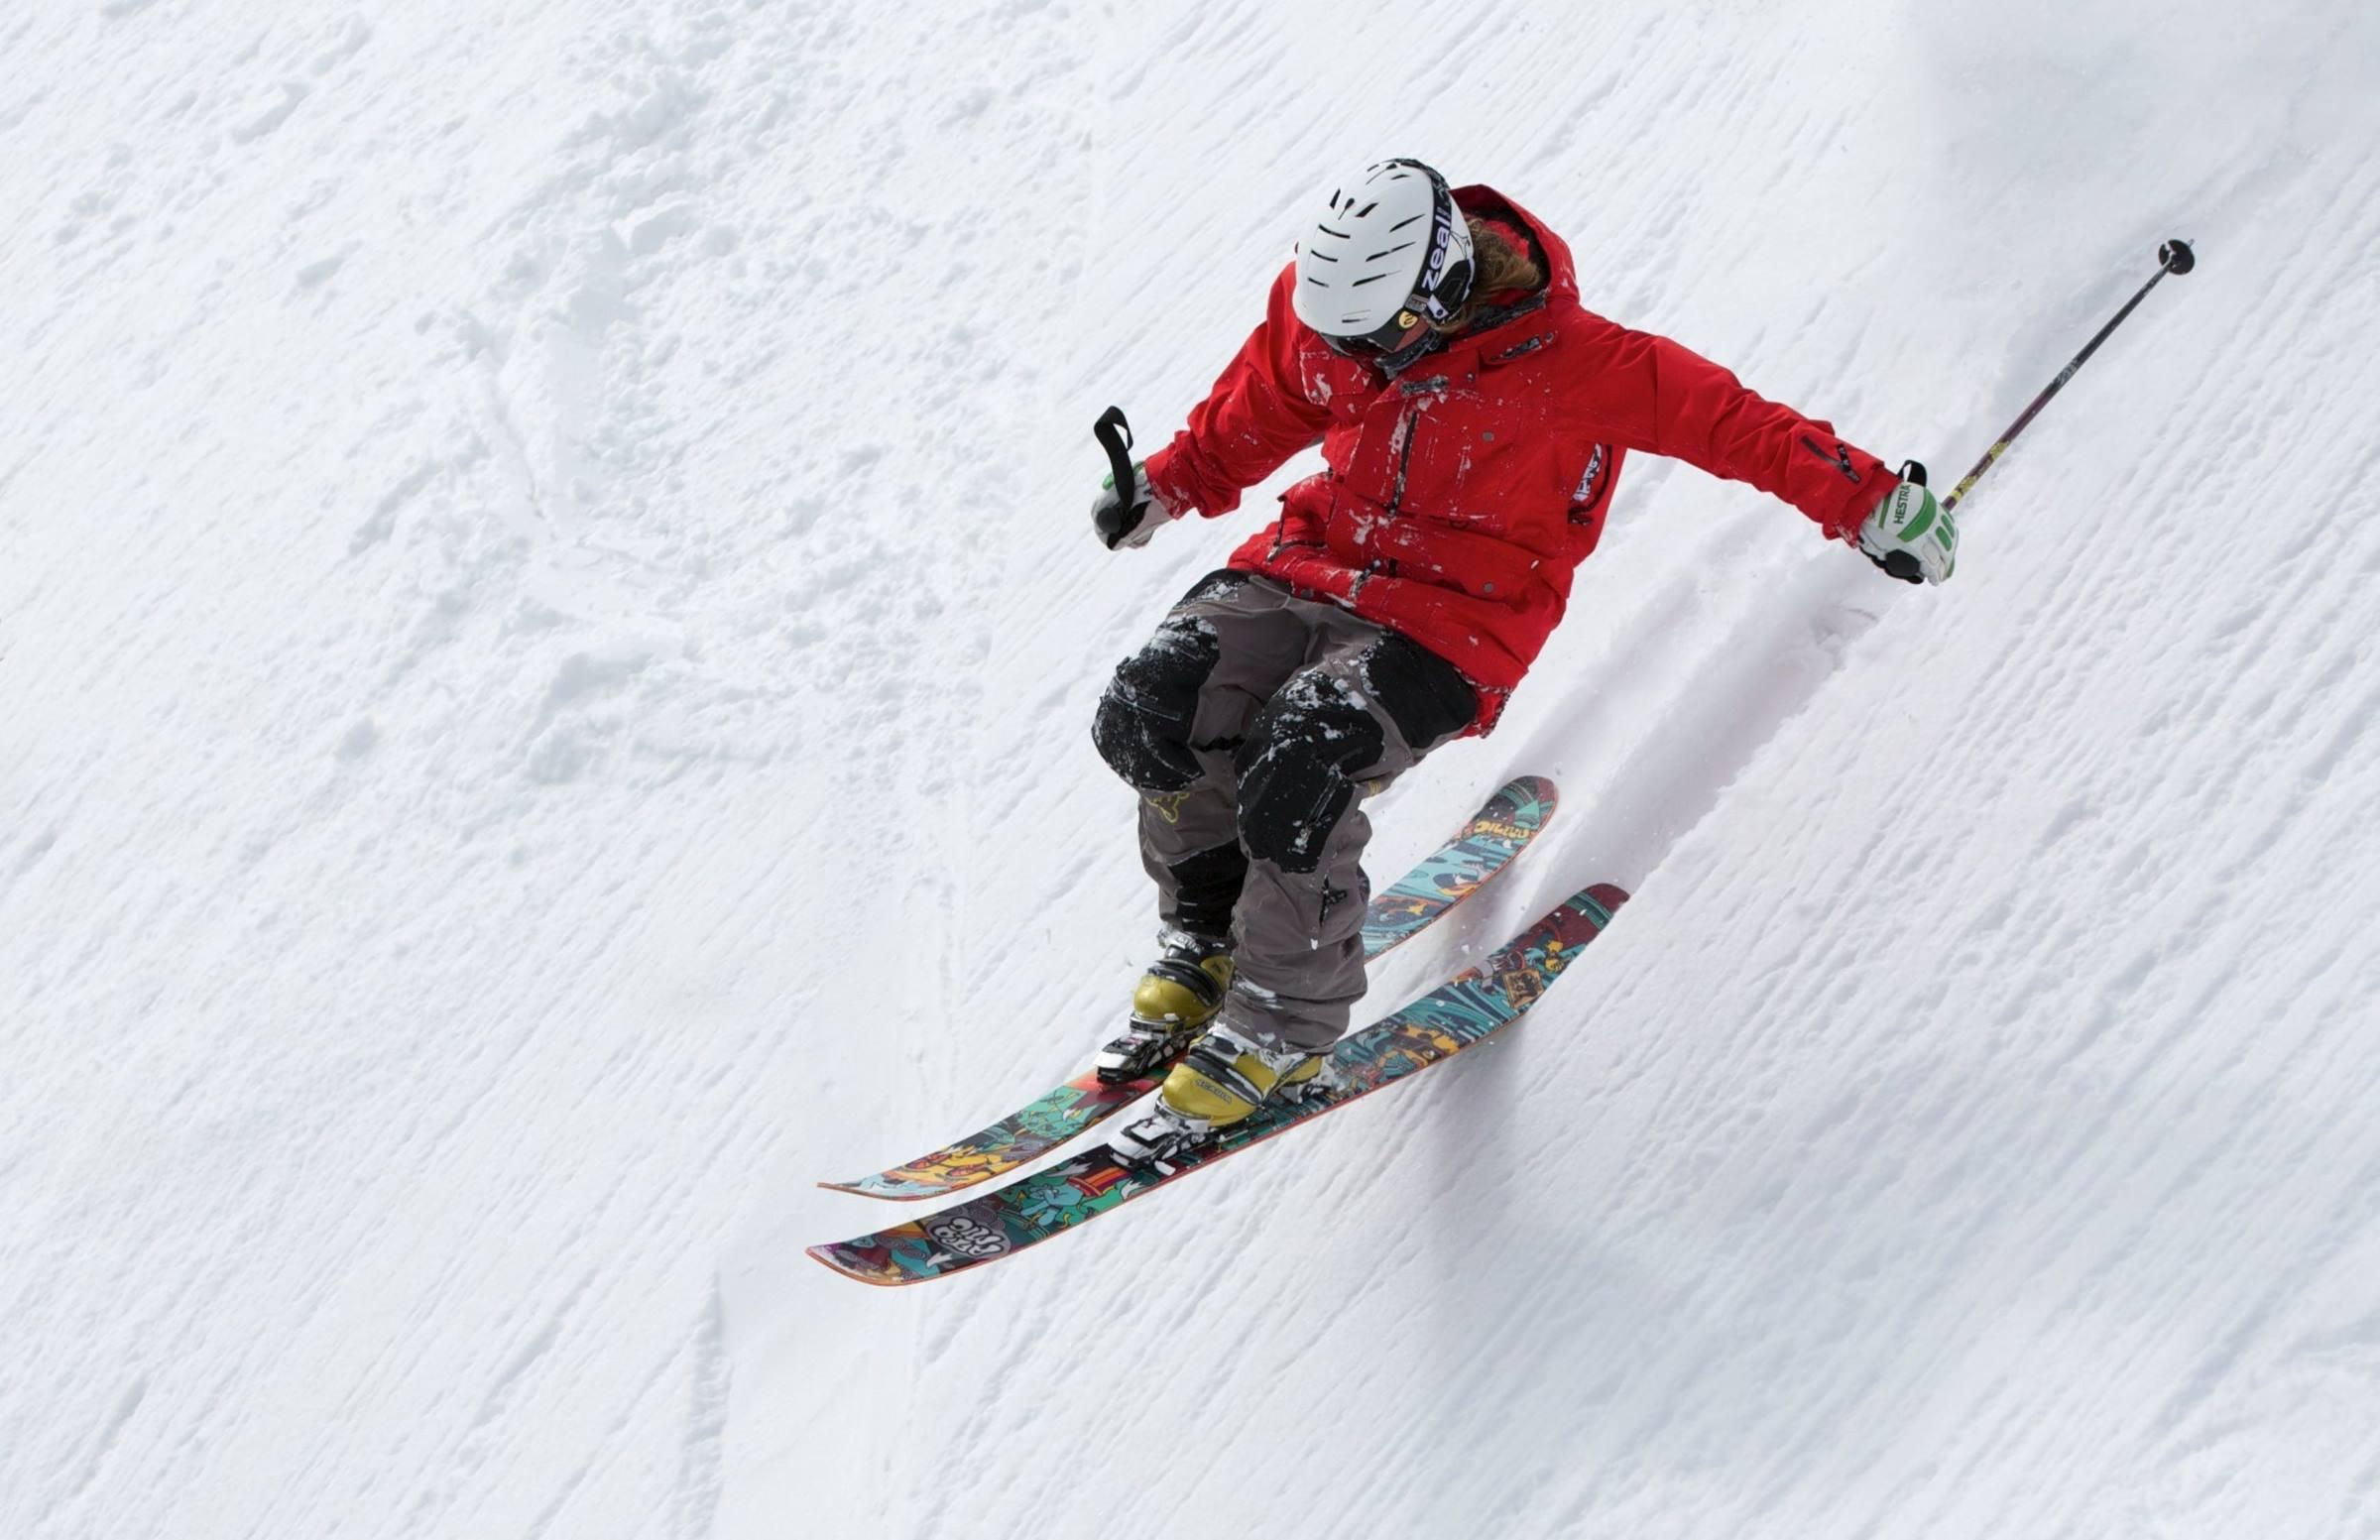 winter skier skiing downhill ski slope